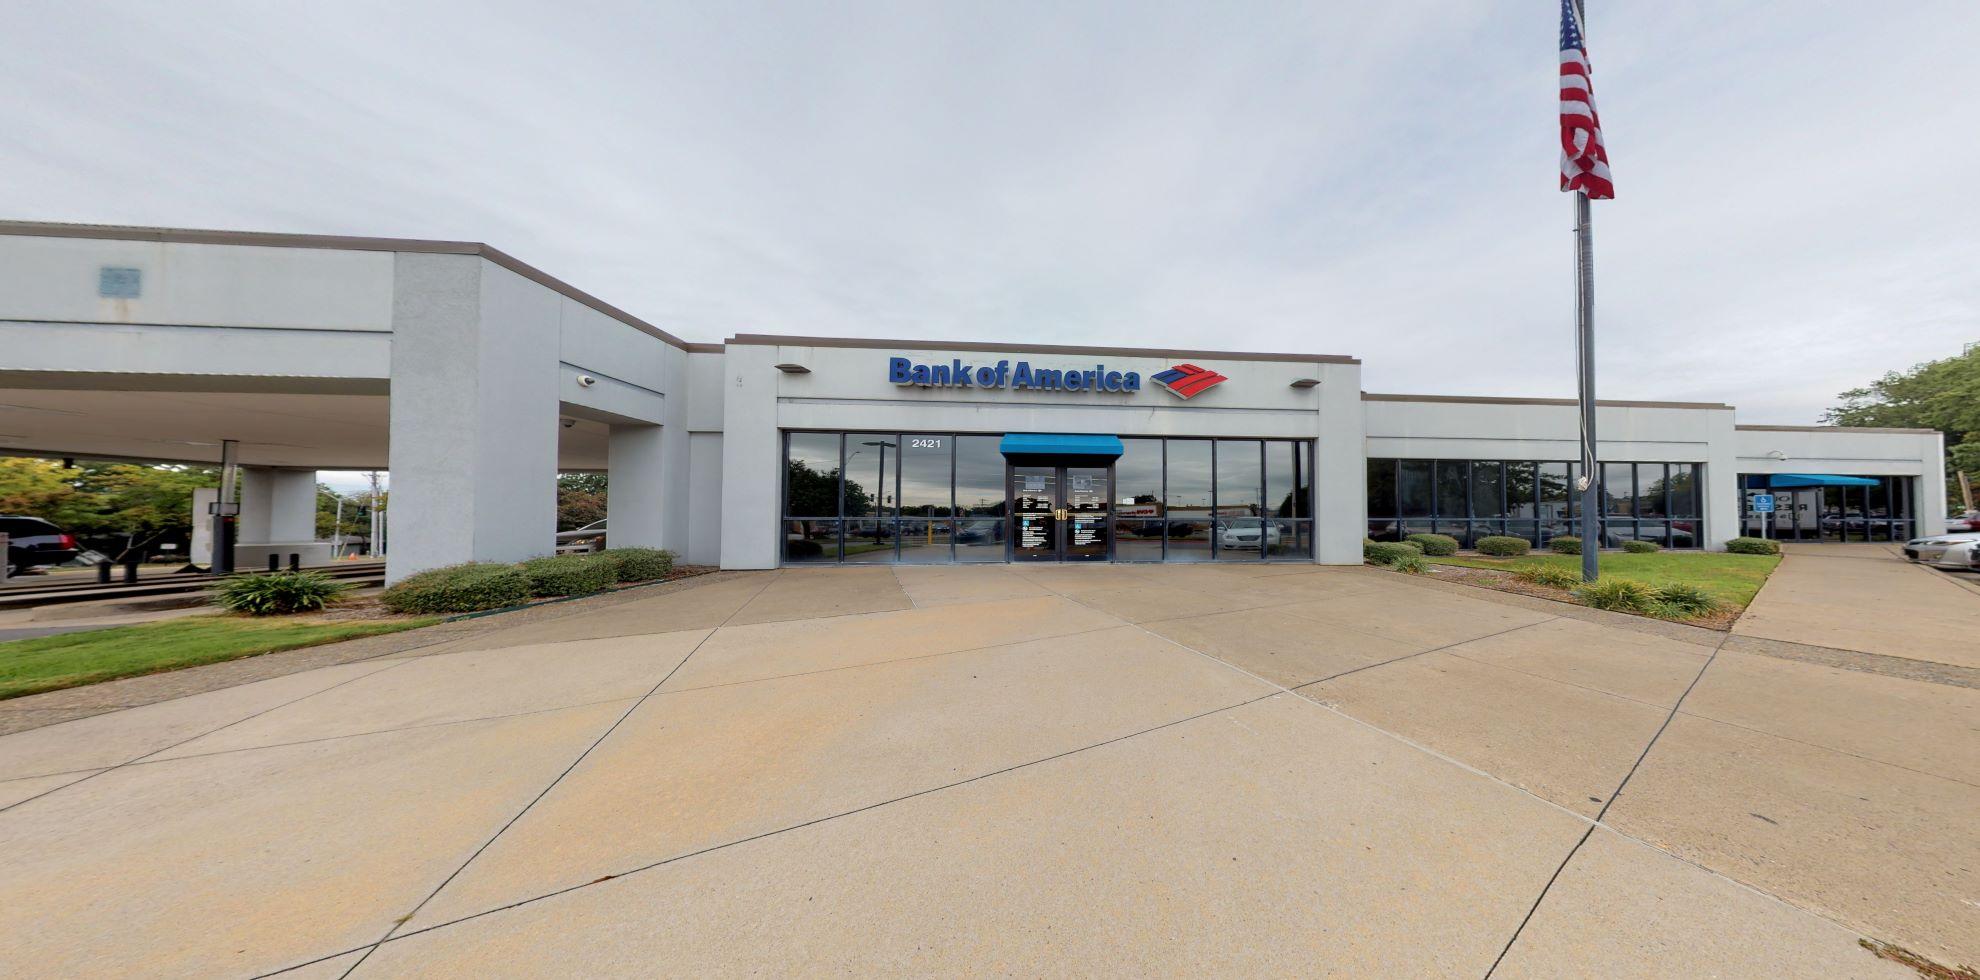 Bank of America financial center with drive-thru ATM | 11315 N Rodney Parham Rd, Little Rock, AR 72212